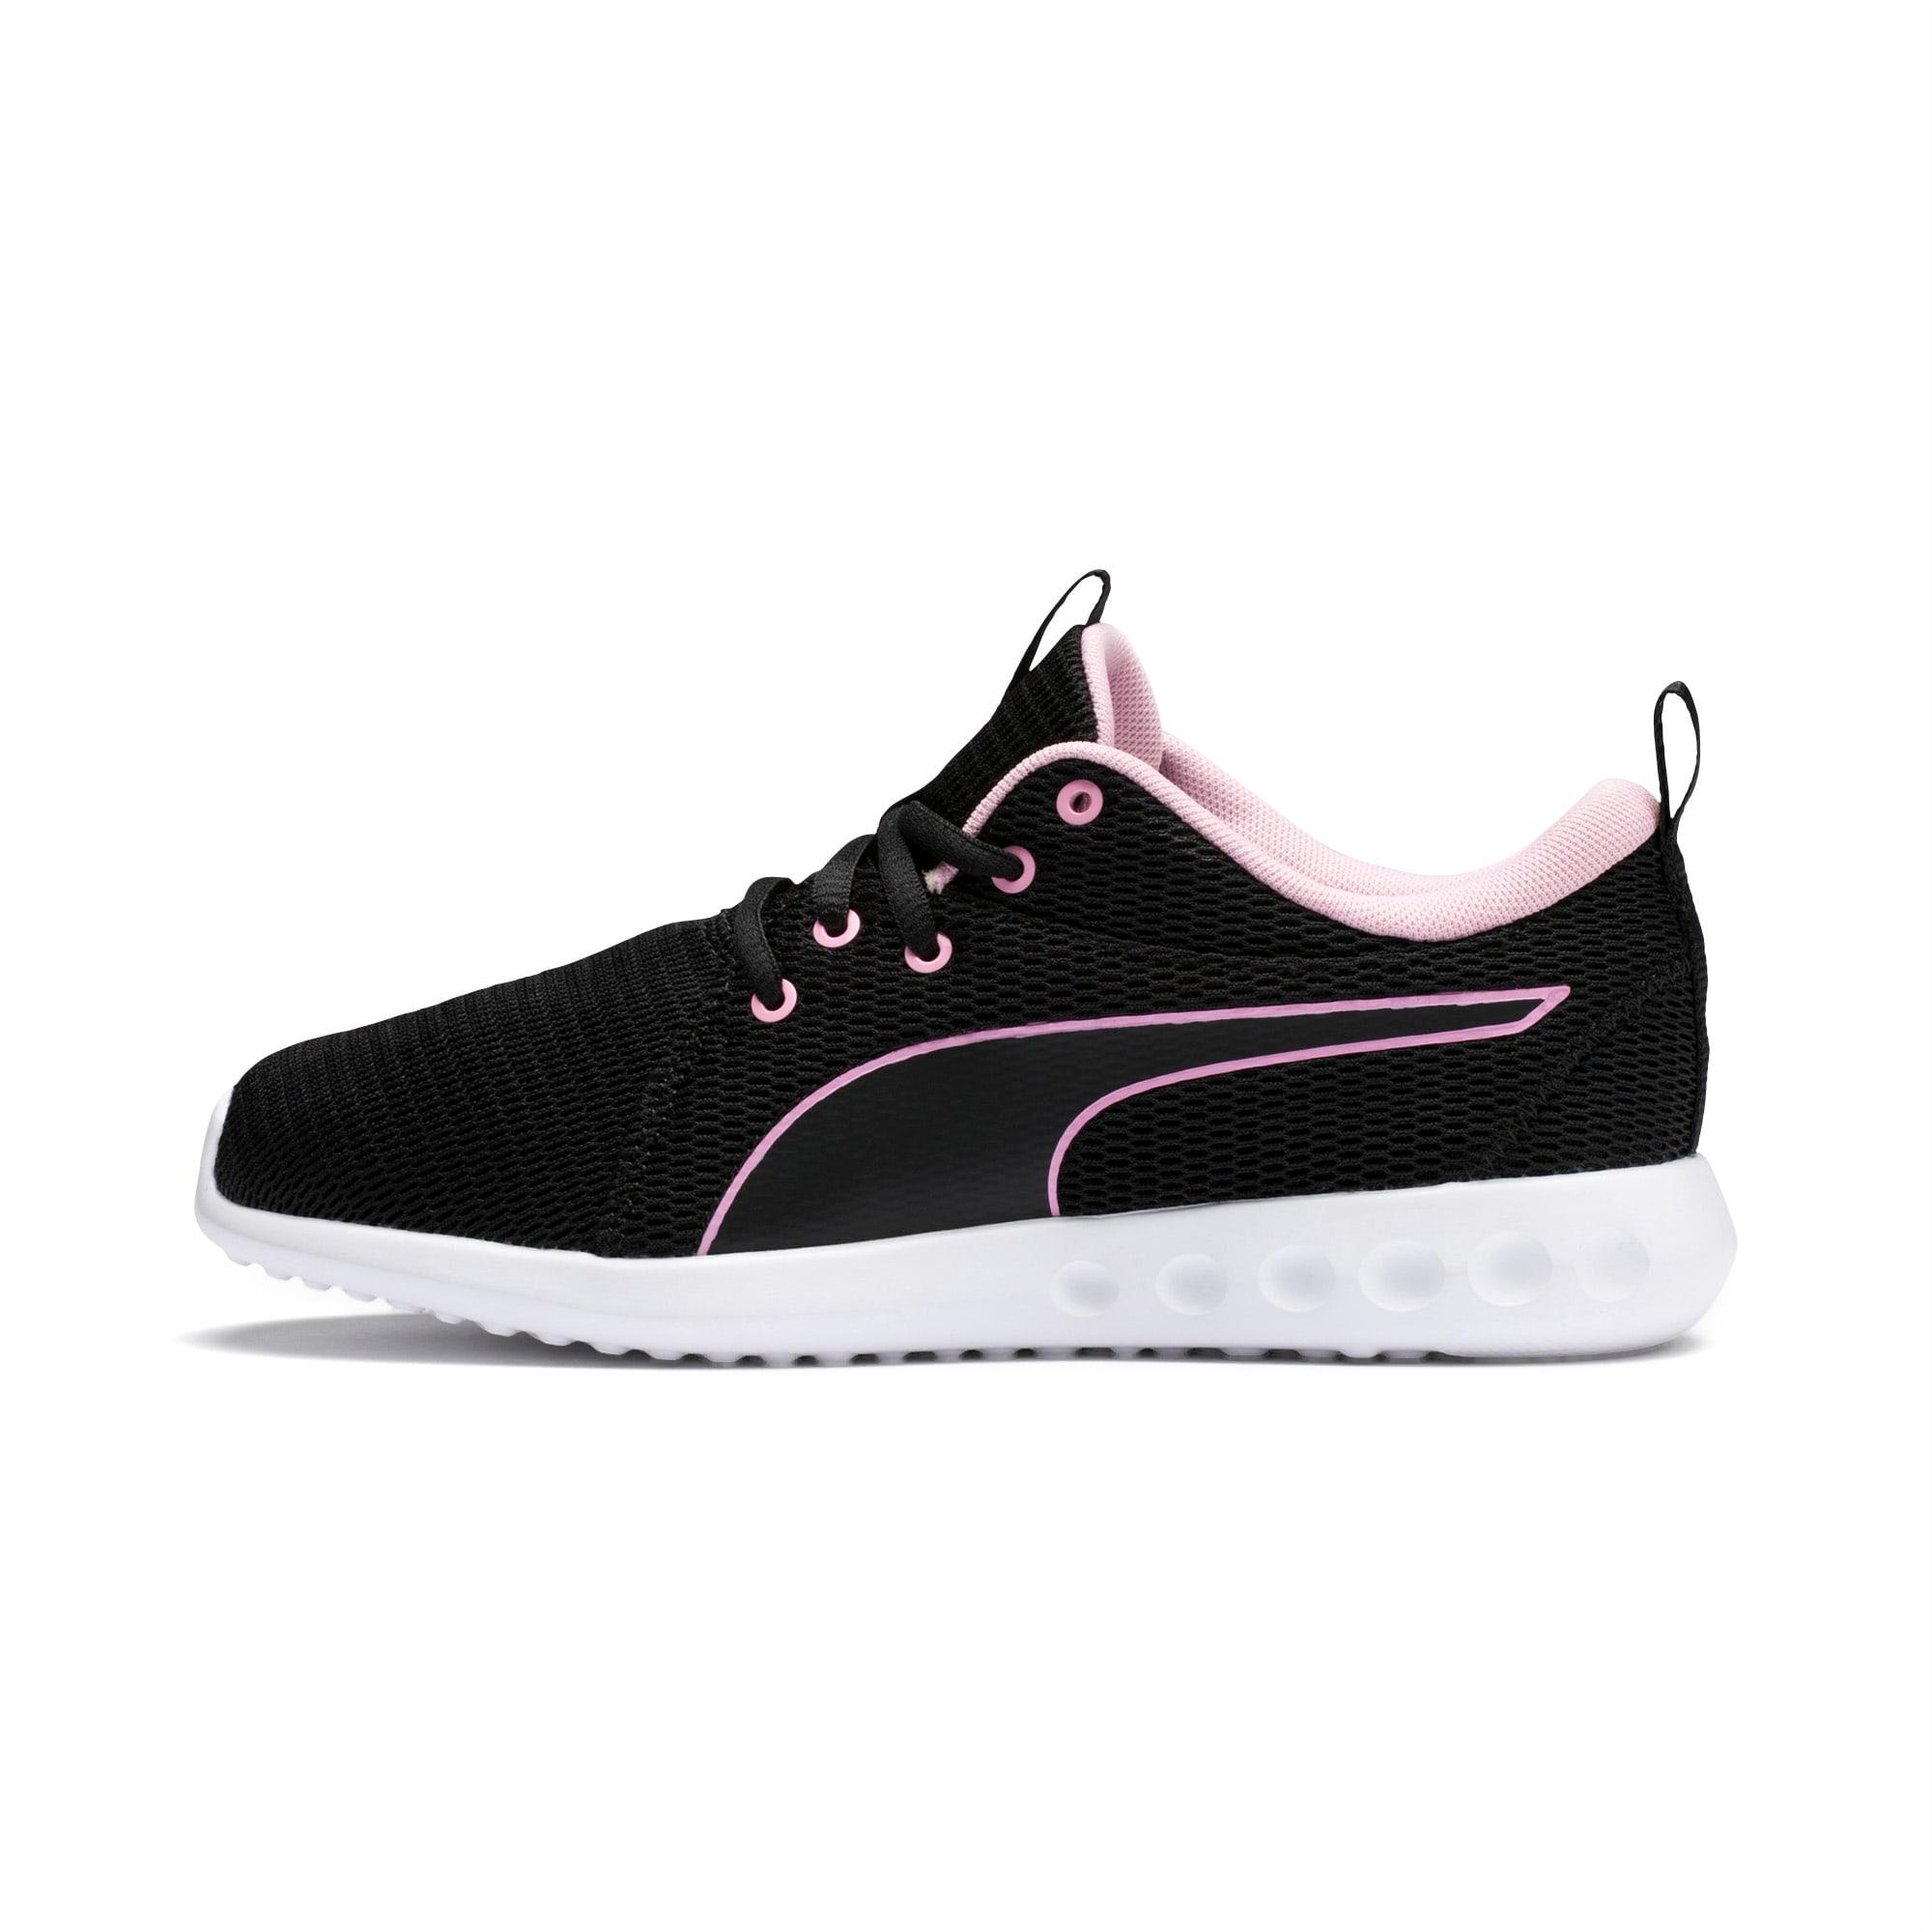 puma nuove donna scarpe